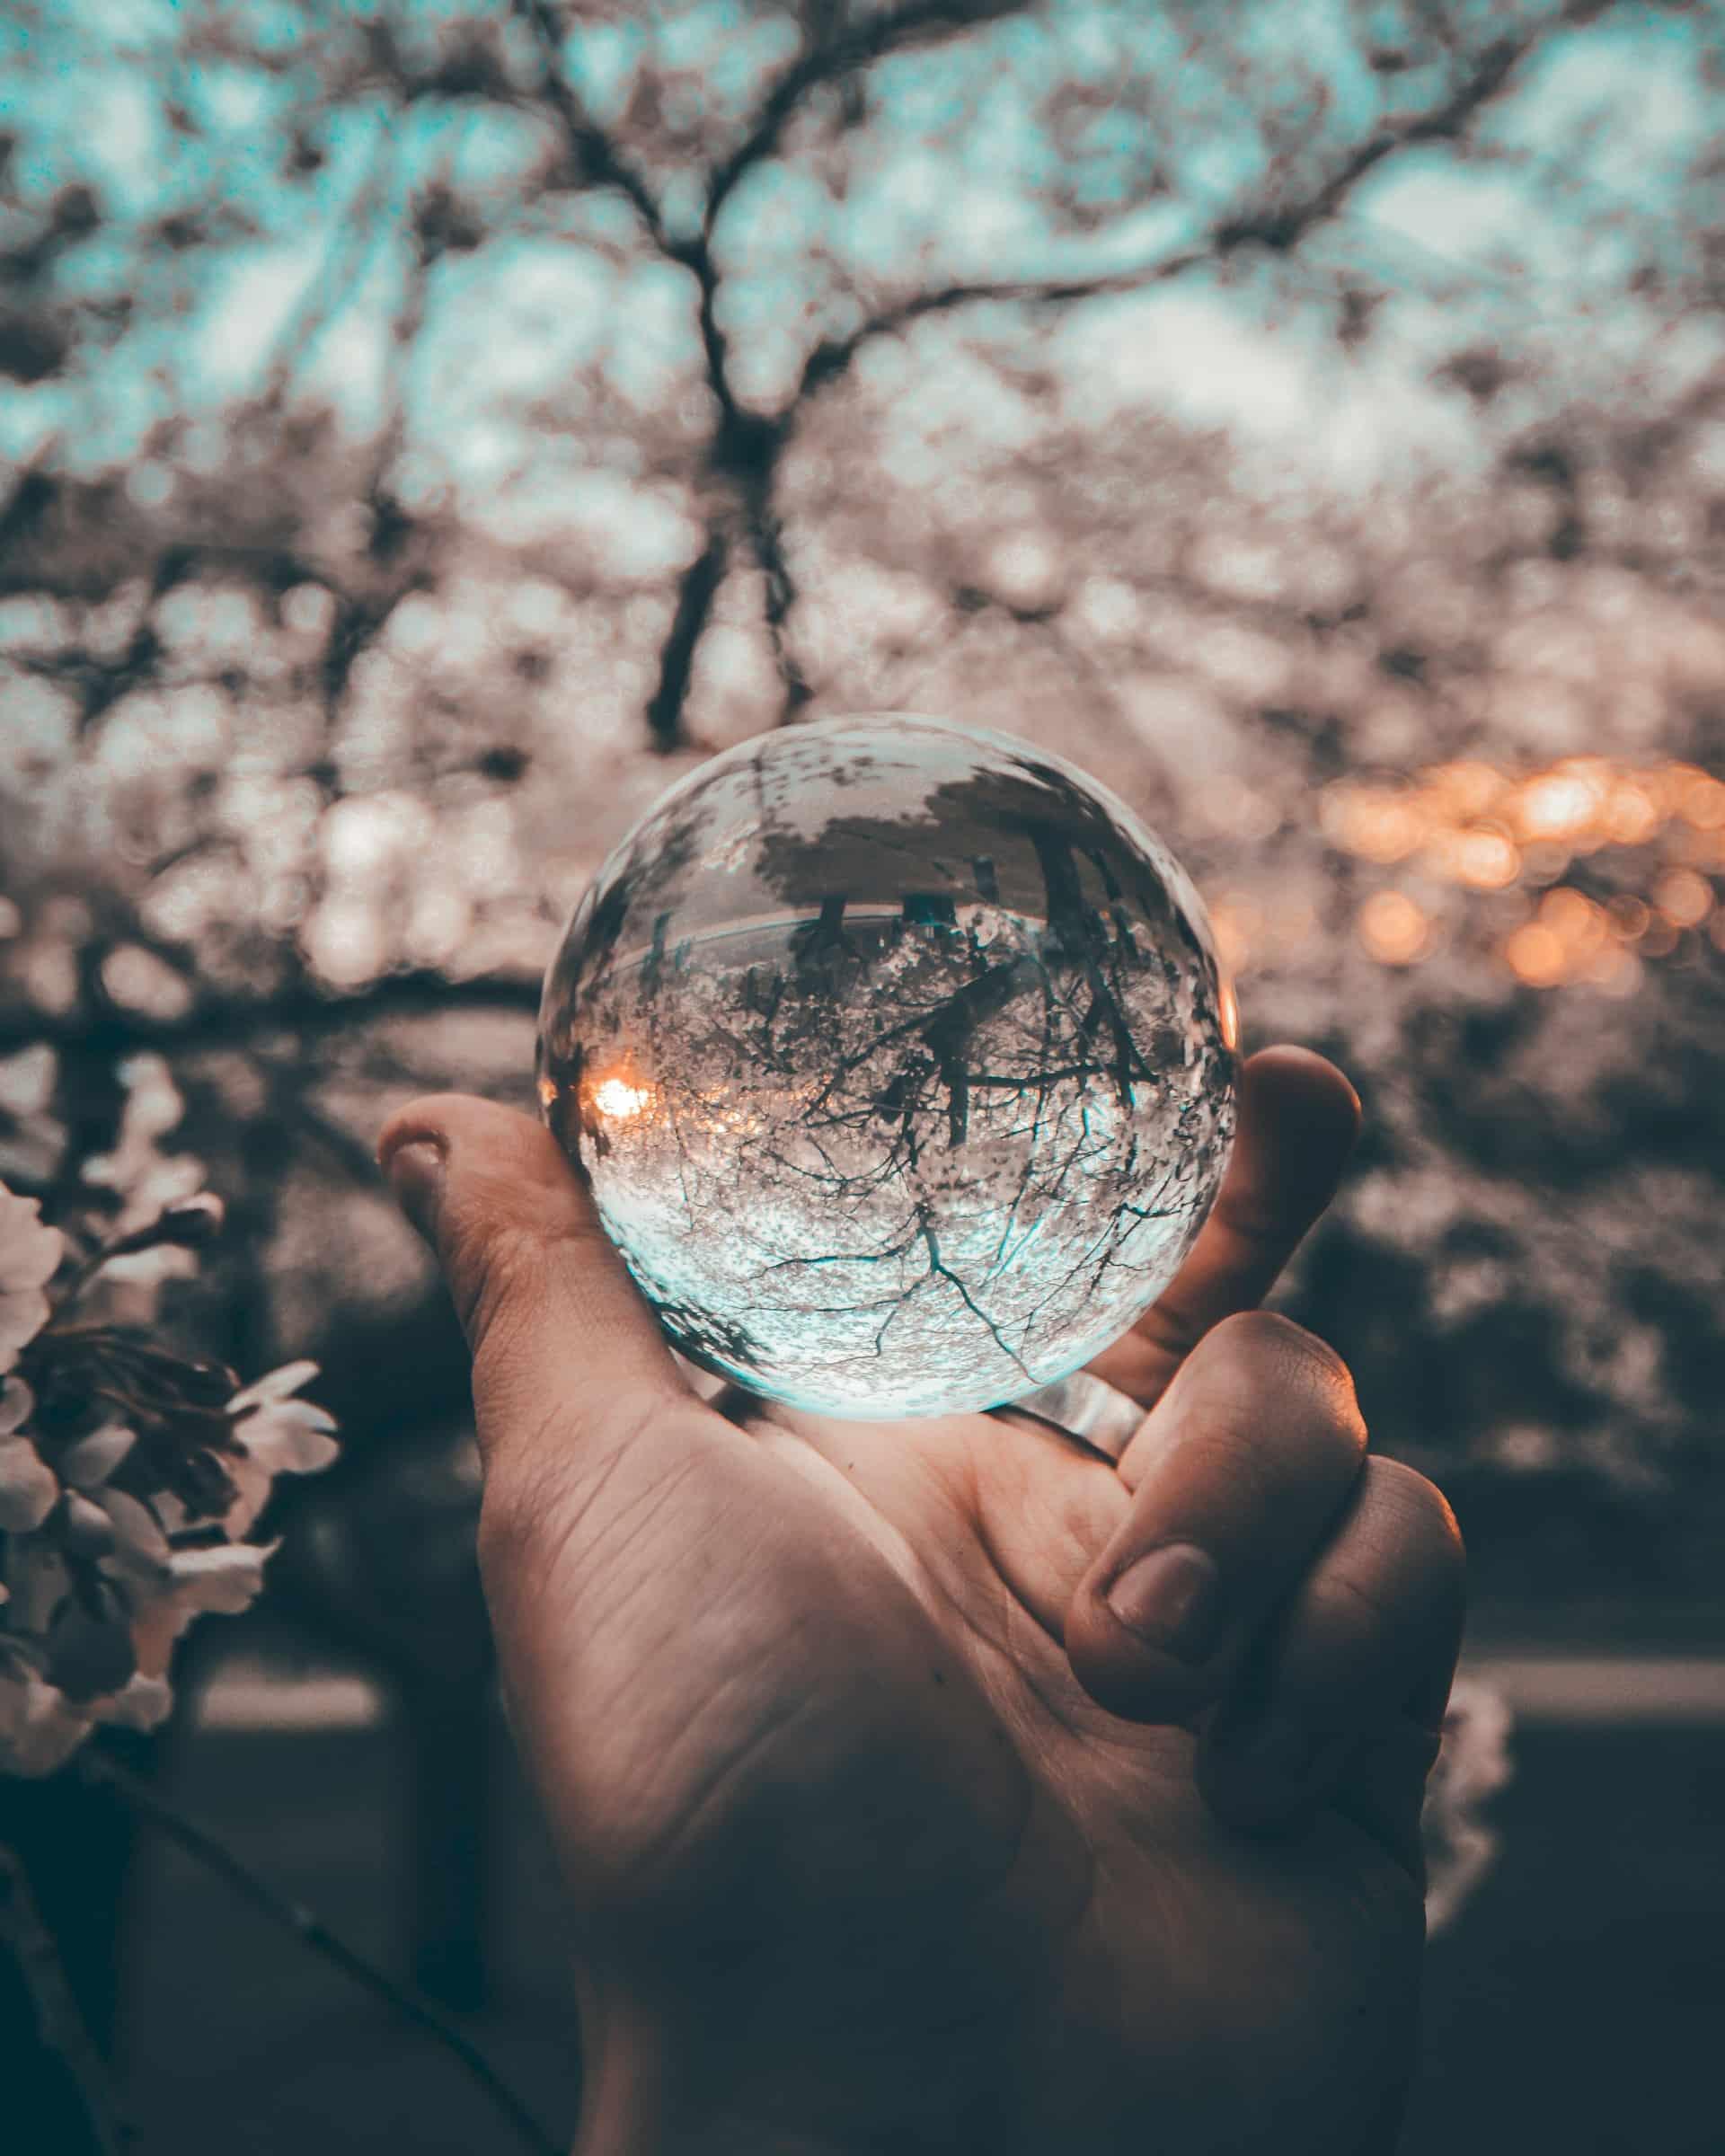 a hand holding a reflective glass ball